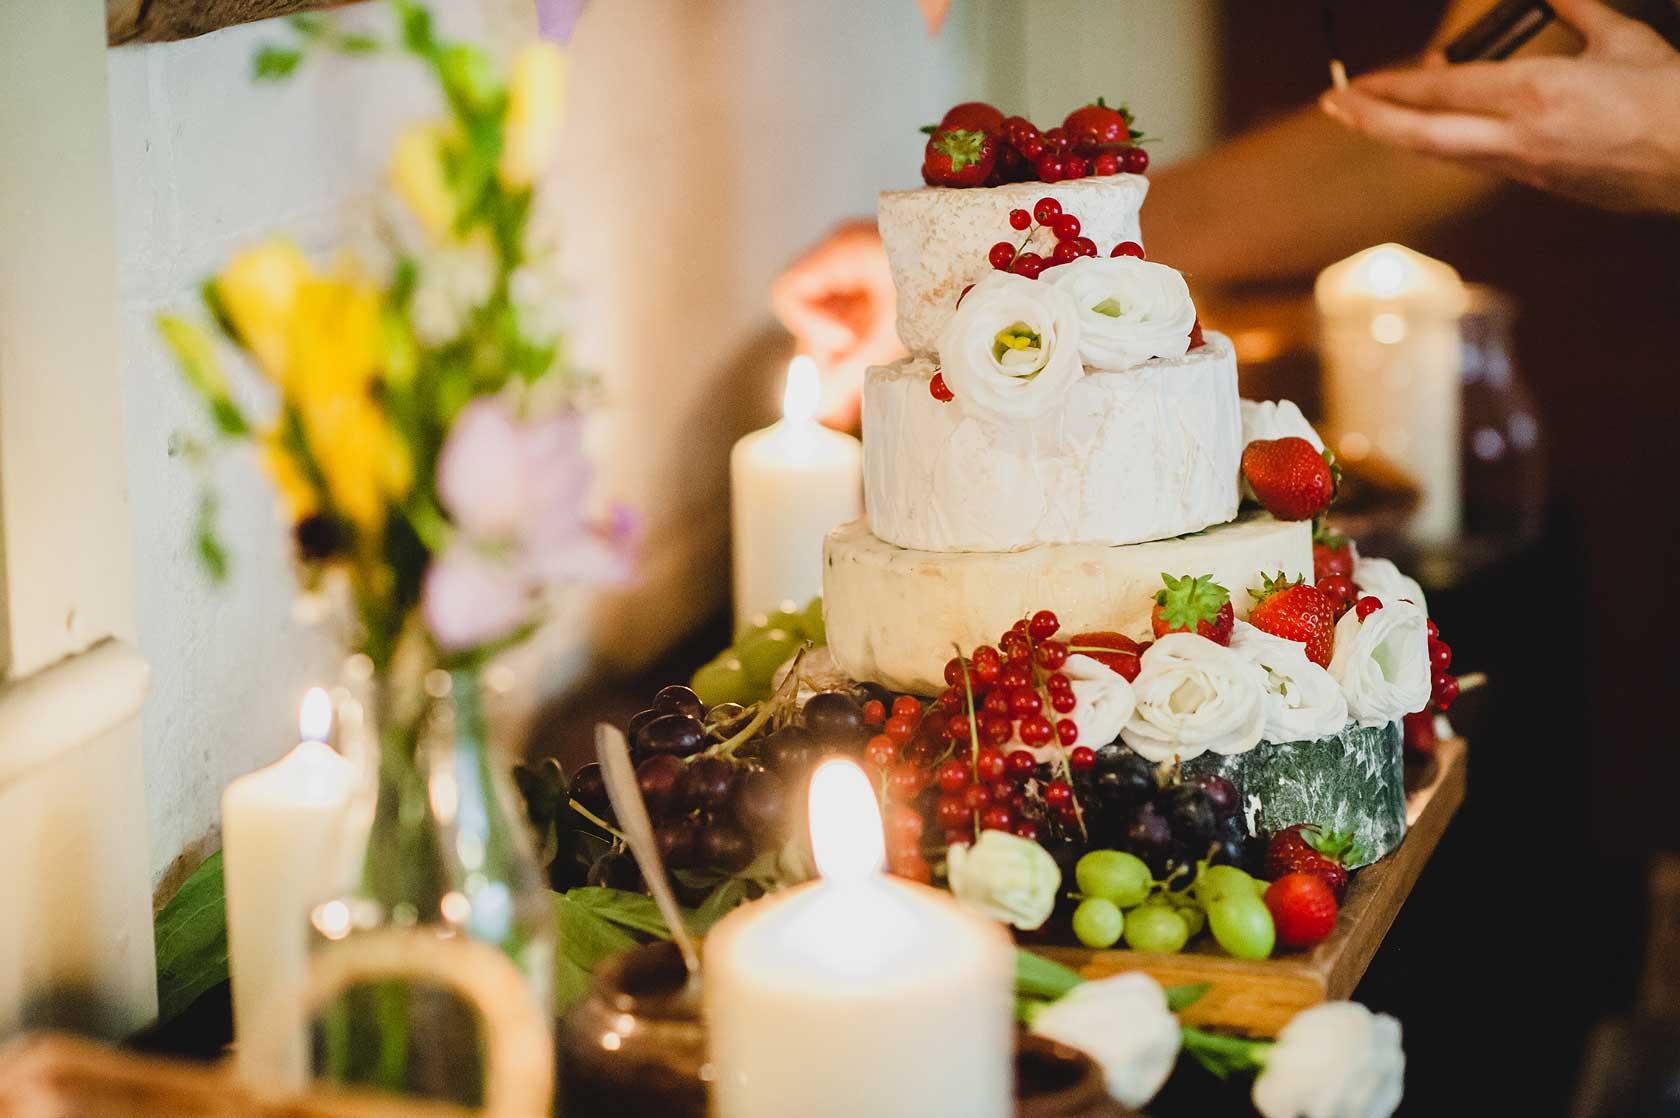 Reportage Wedding Photography at Hackney City Farm